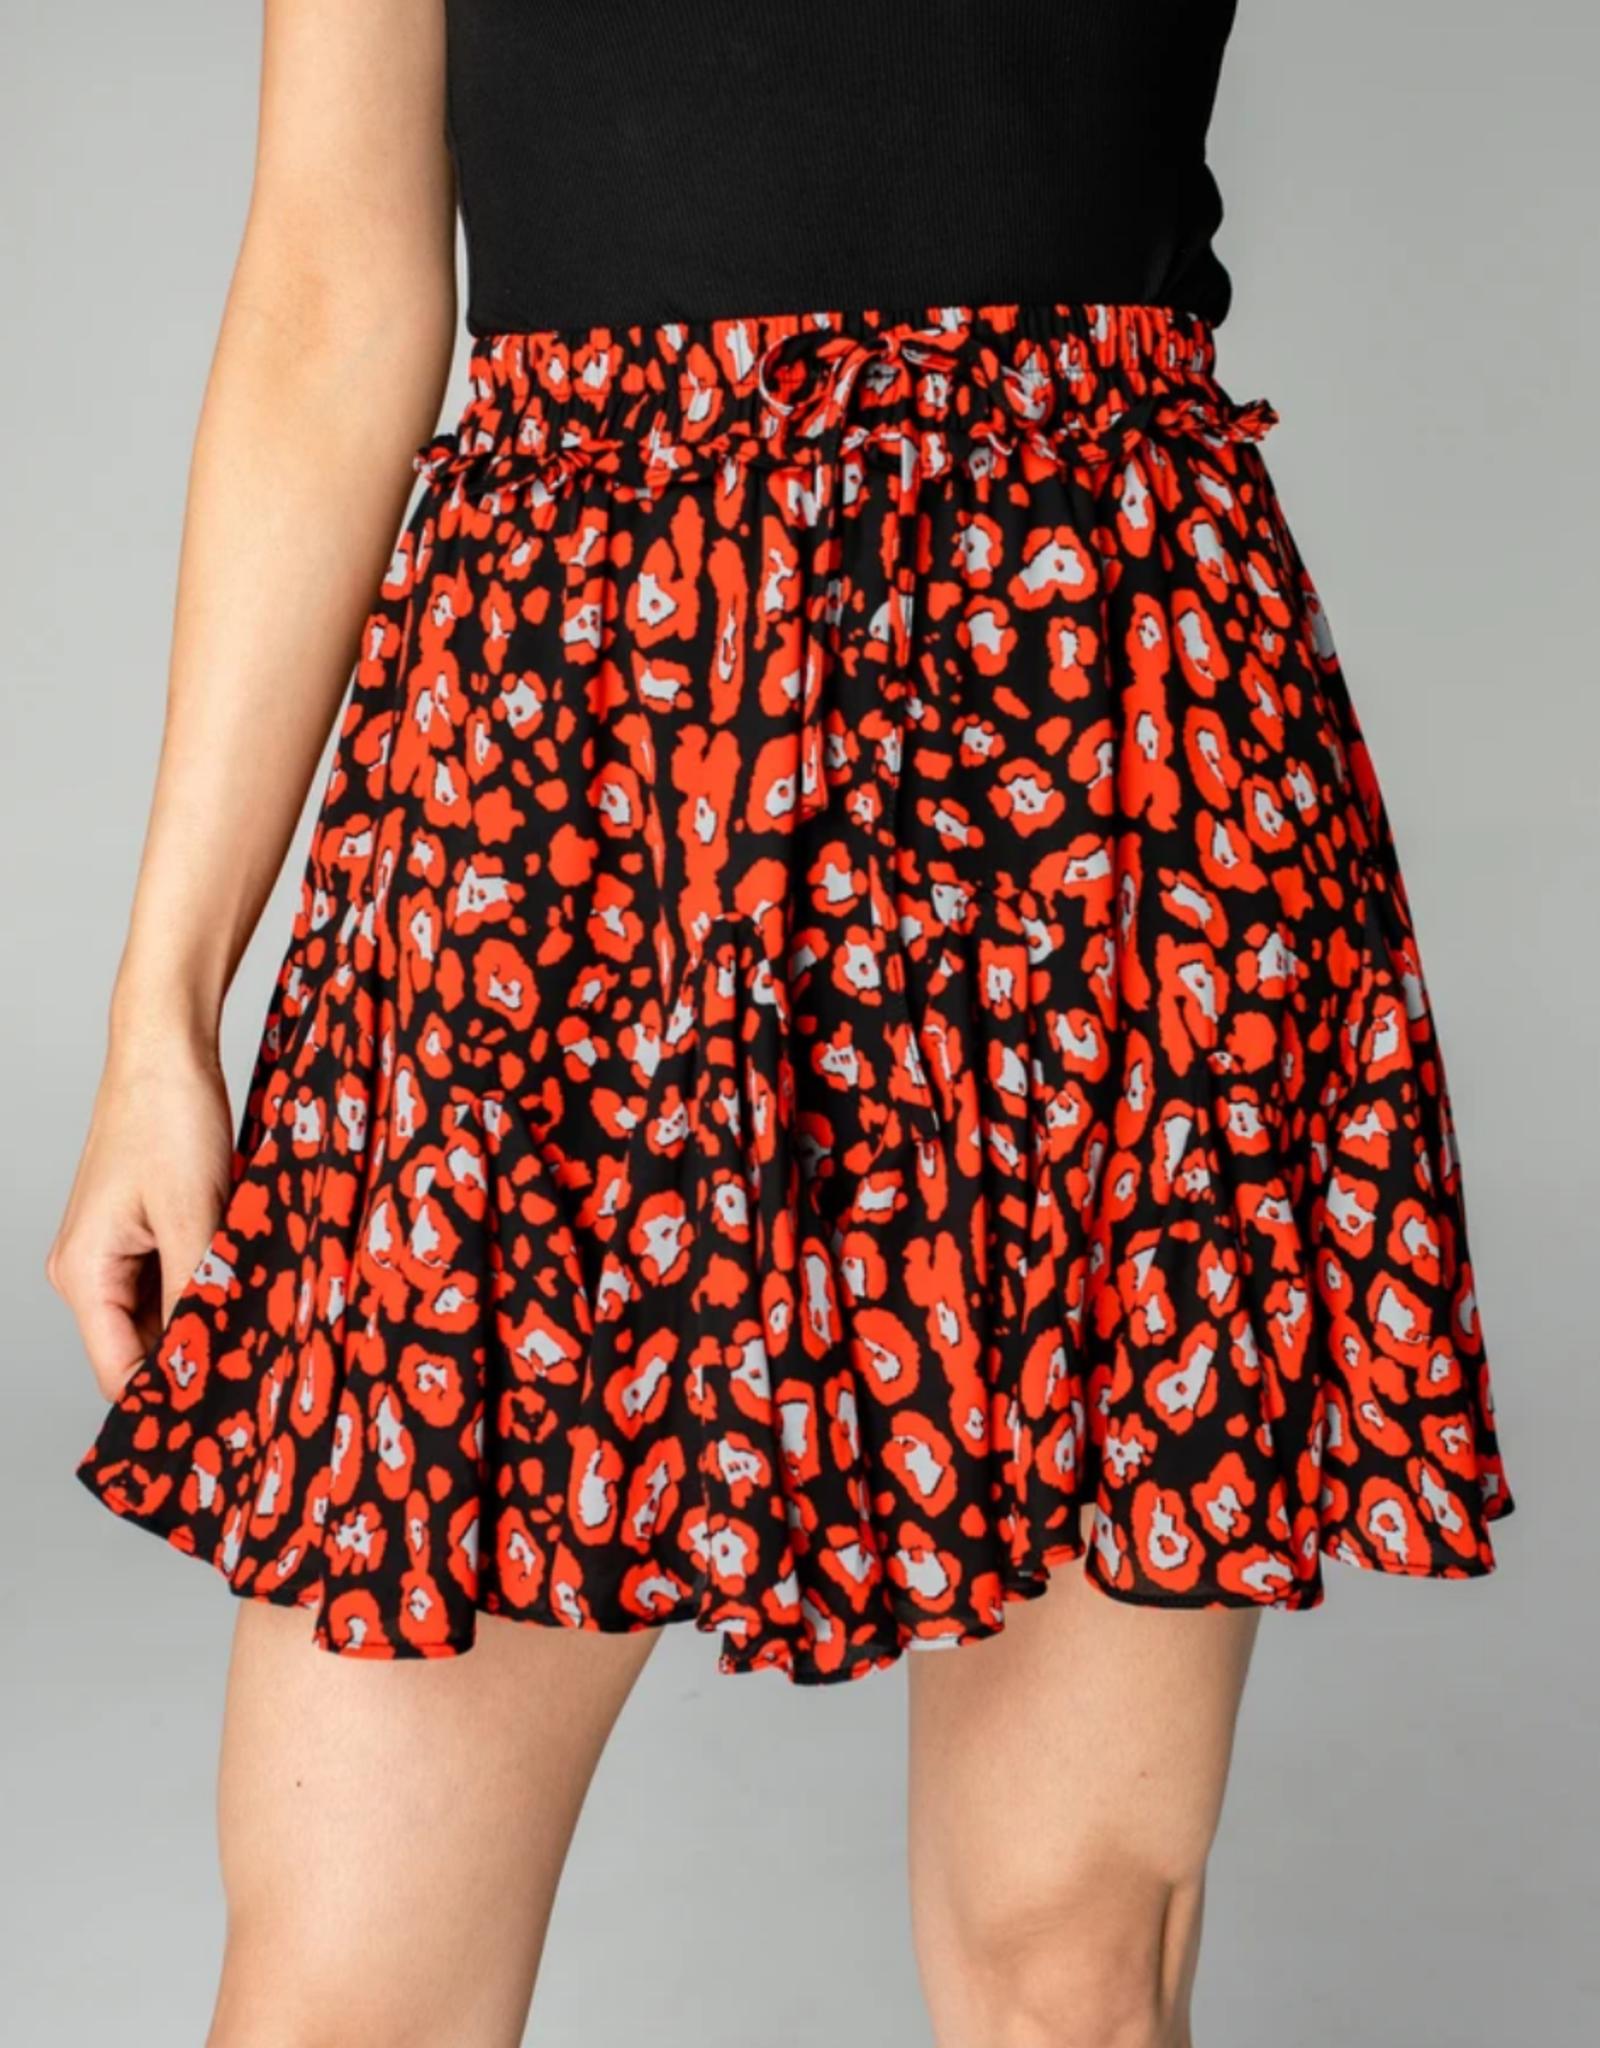 Buddy Love Presley Ruffled Mini Skirt